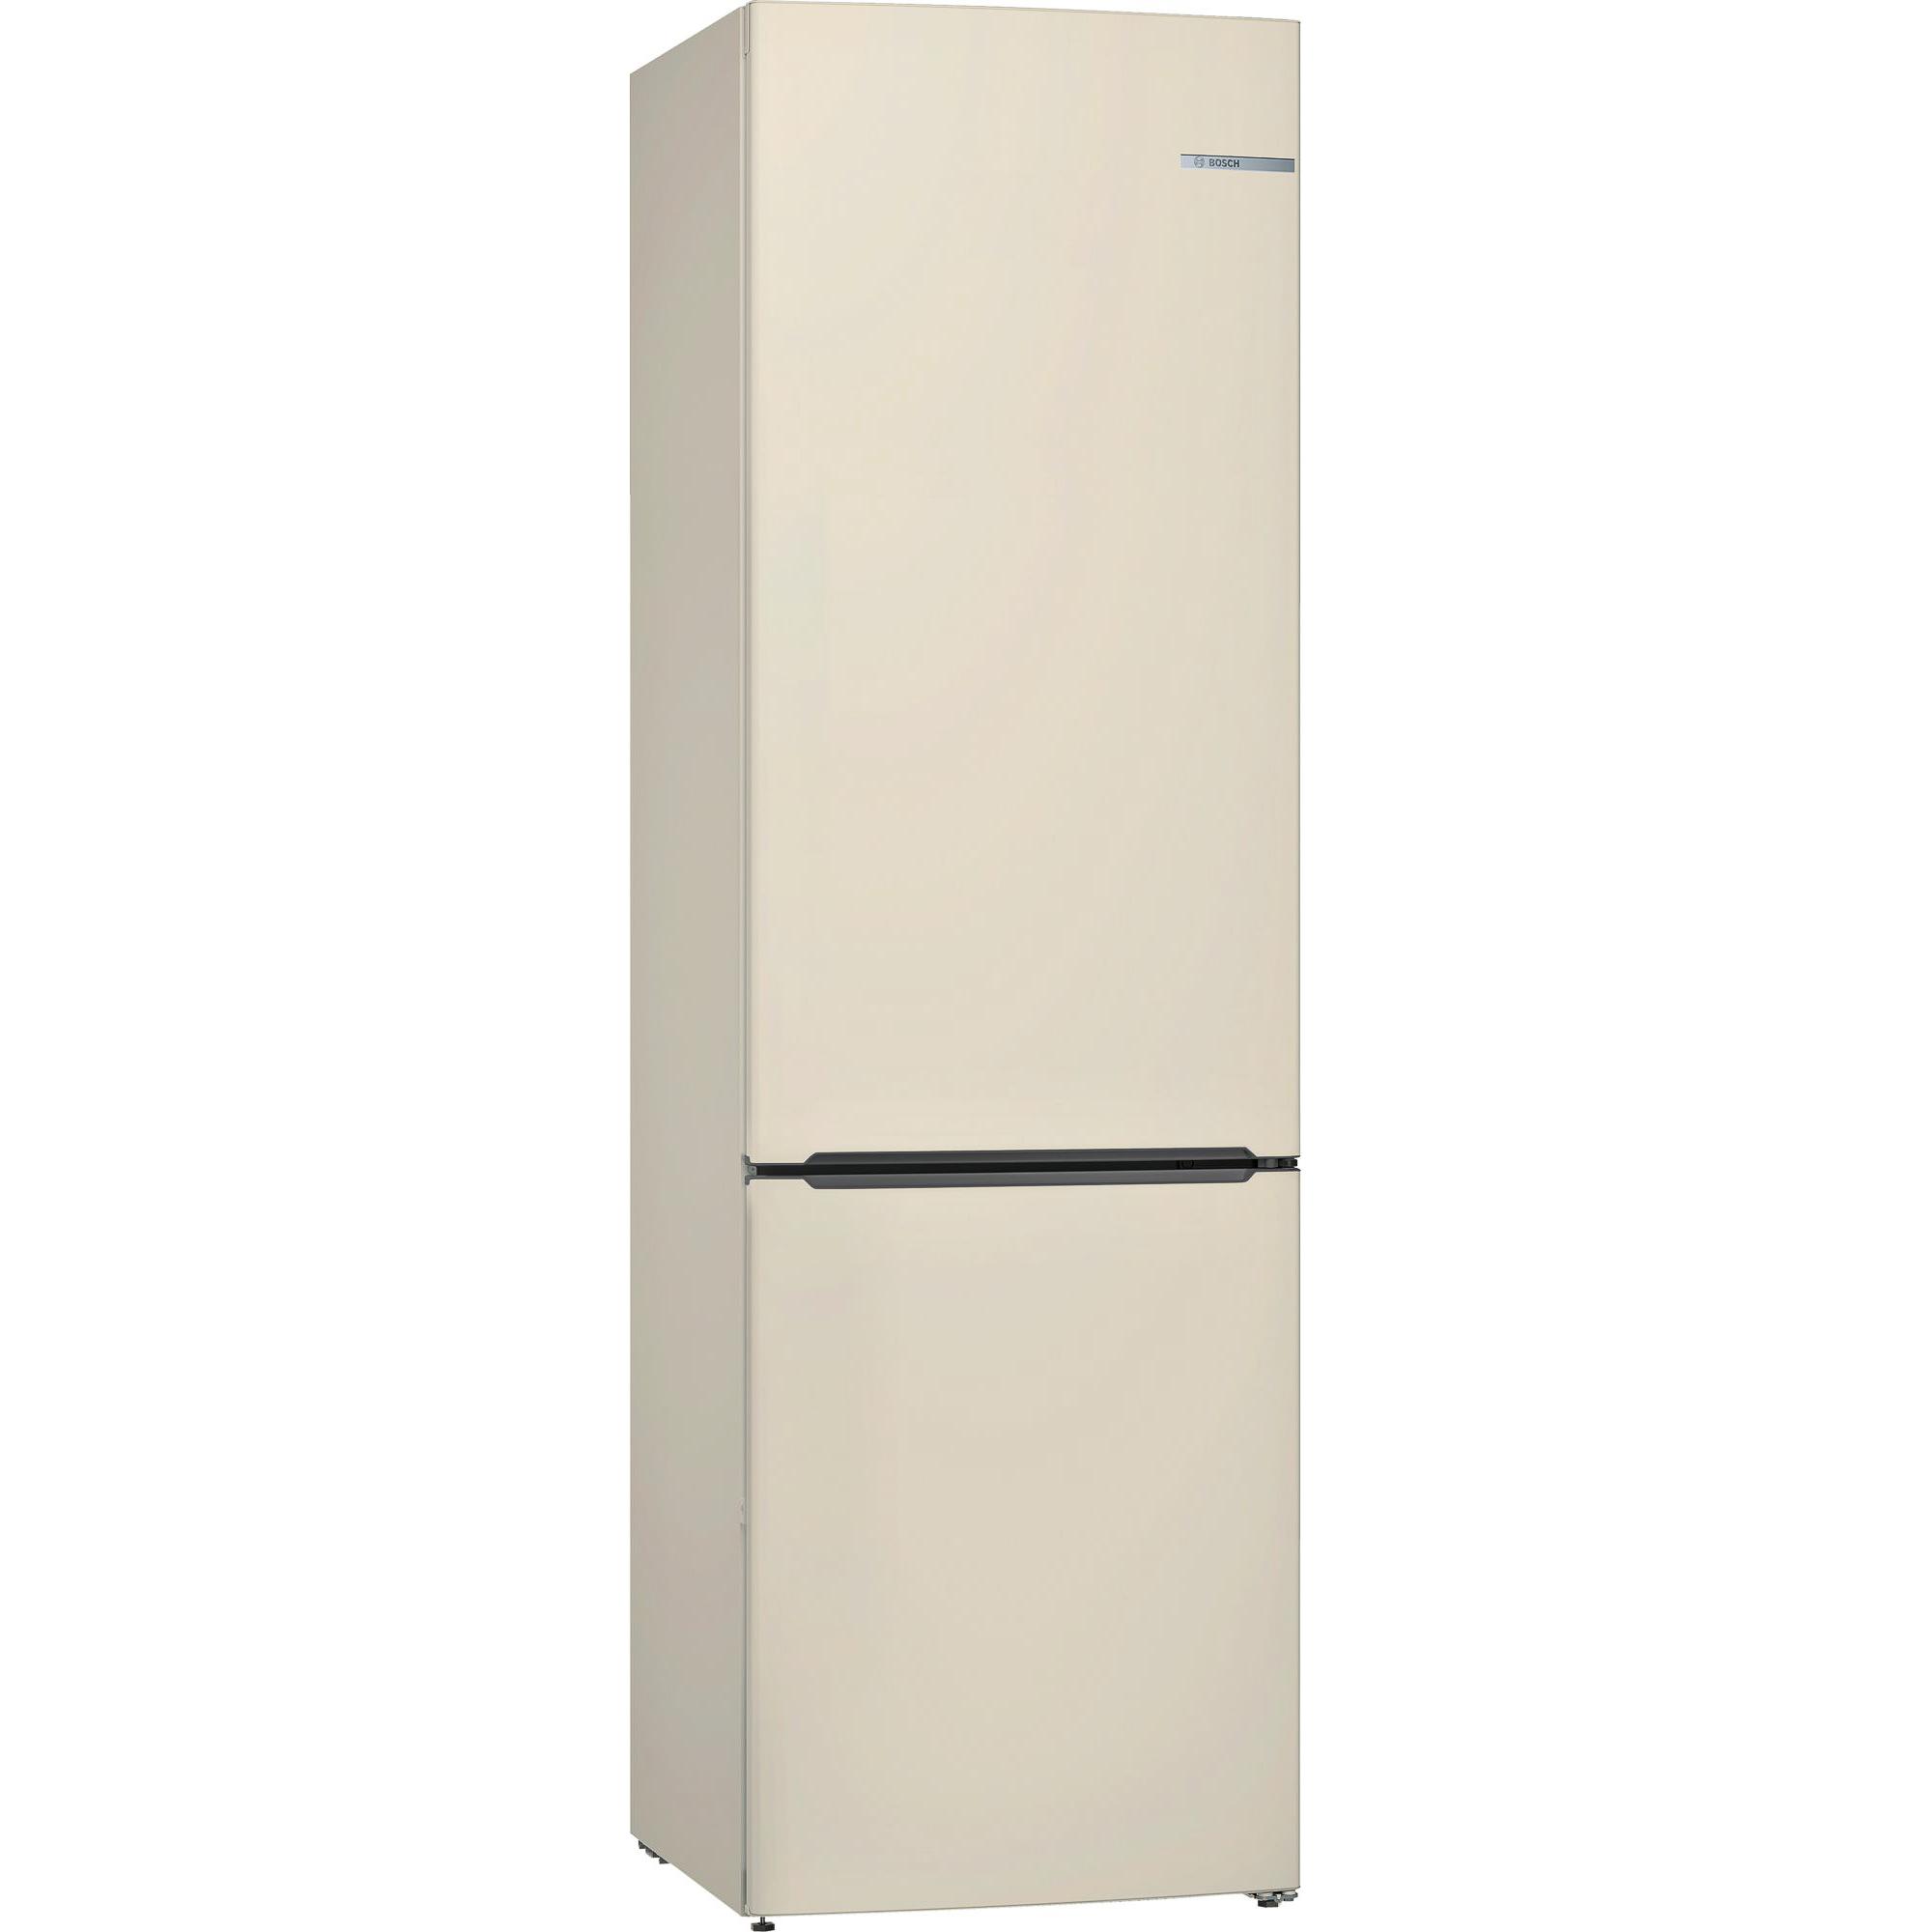 Холодильник BOSCH KGV39XK21R бежевый холодильник bosch kgn36nk2ar